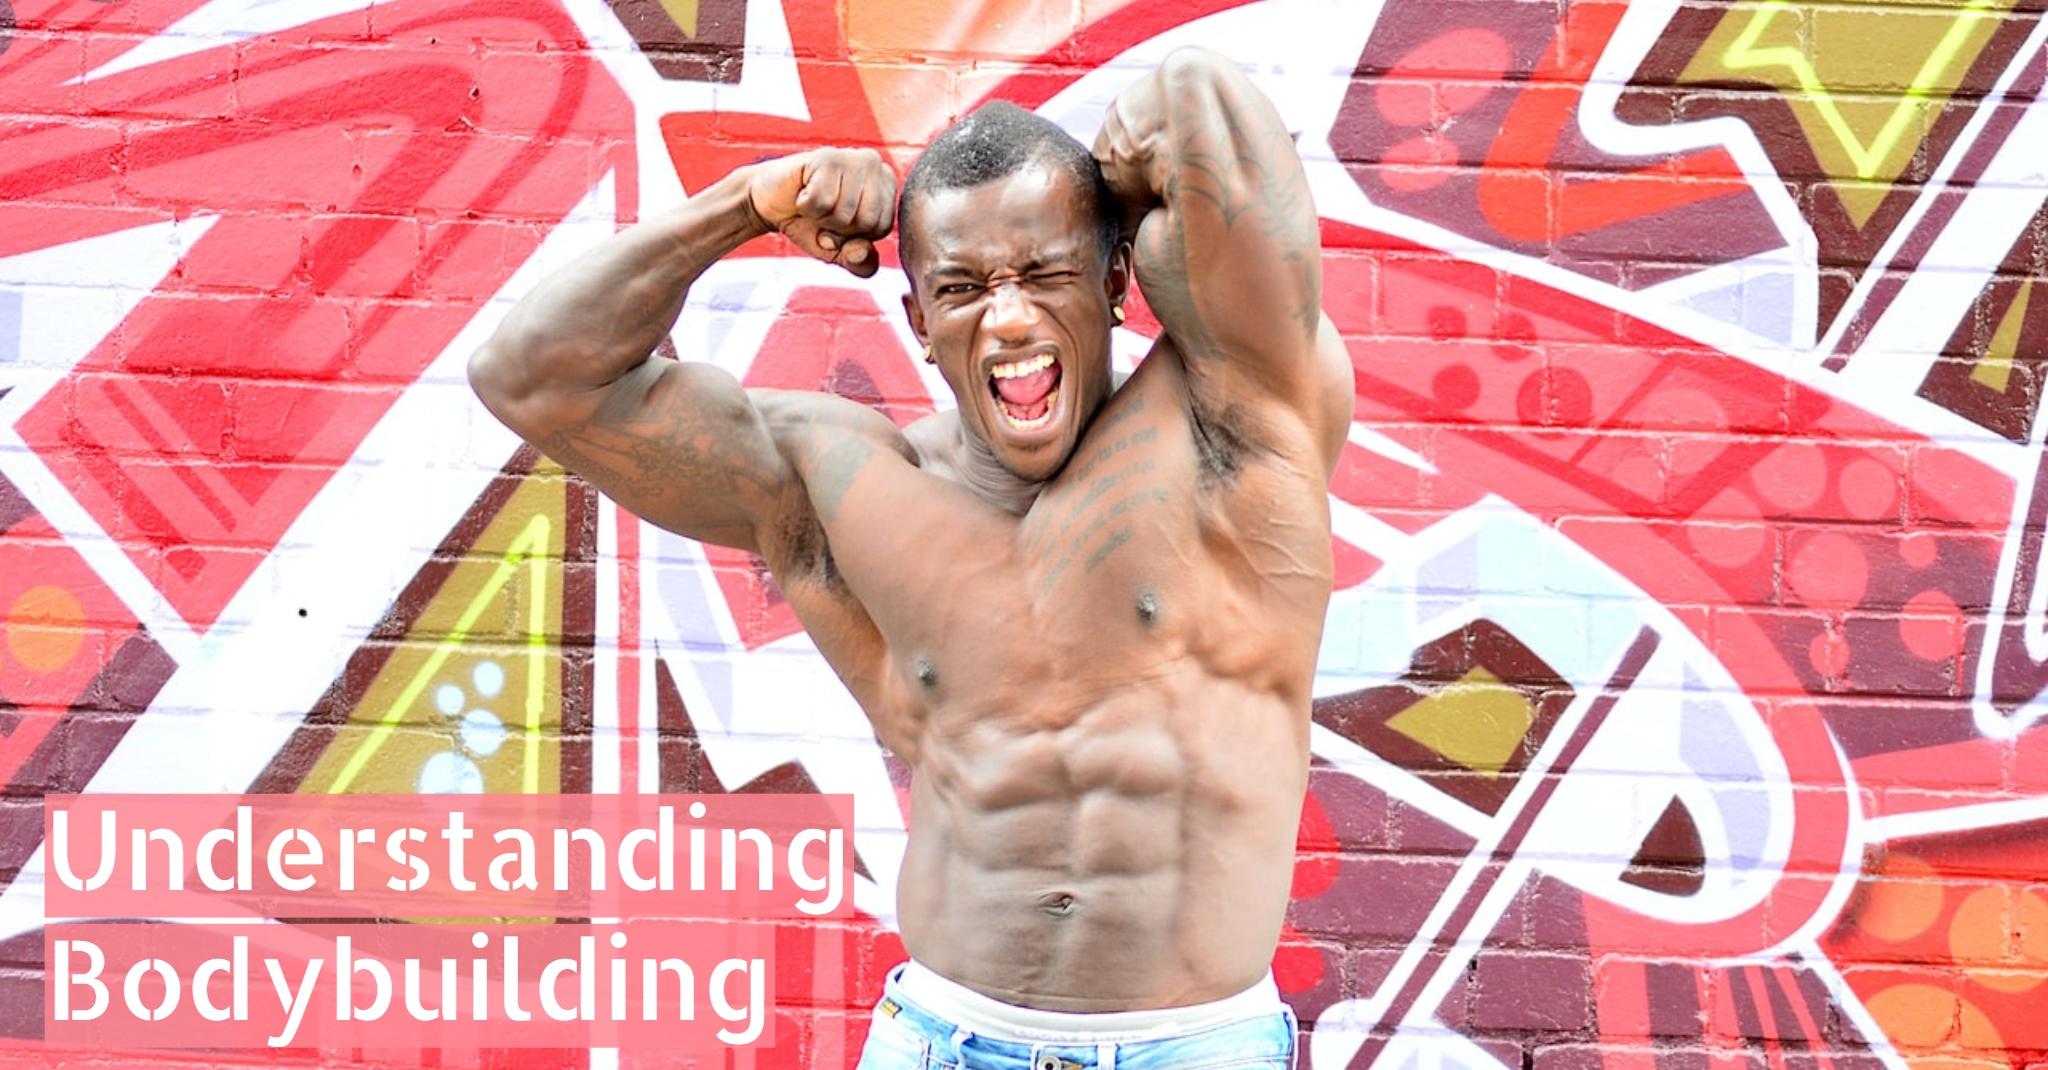 Death, huel bodybuilding And Taxes